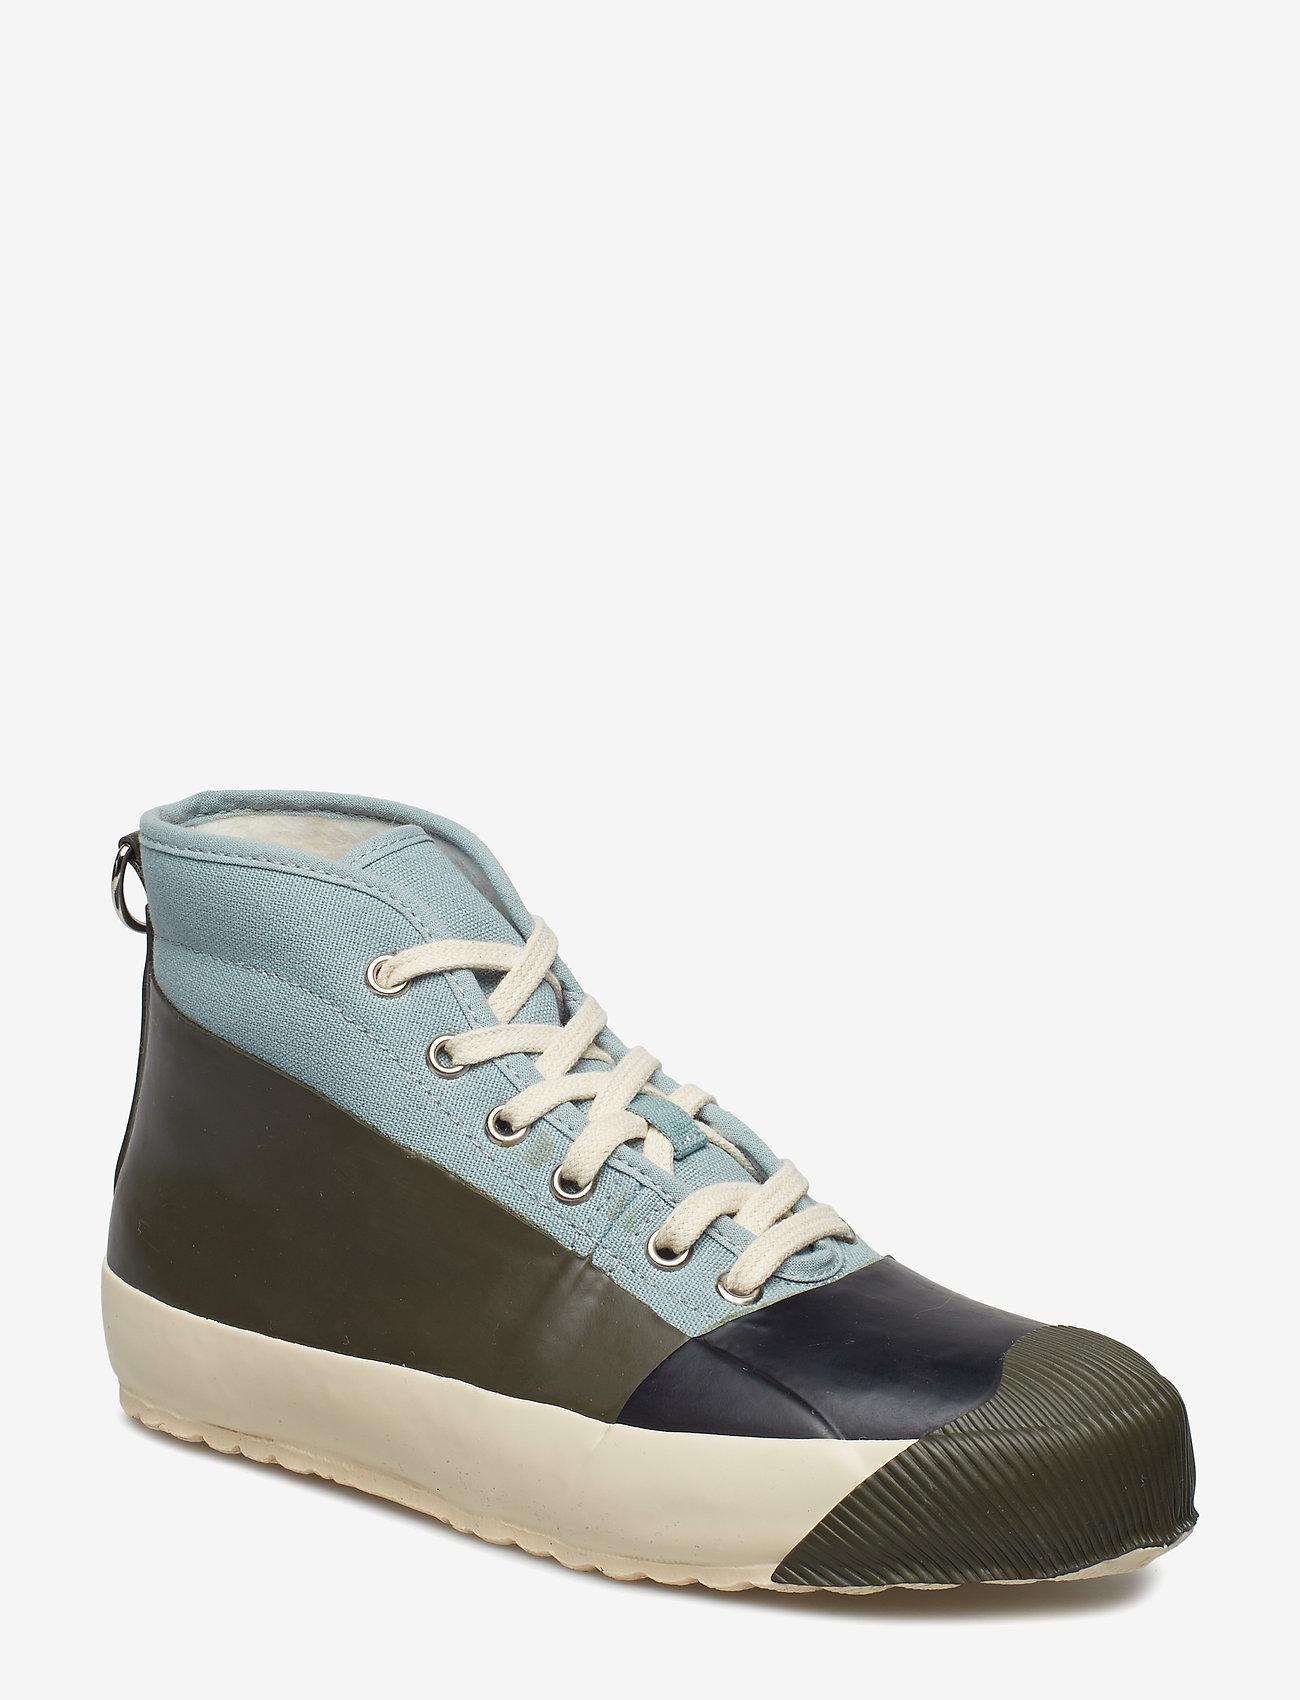 Ilse Jacobsen - RUB SNEAKER - sneakersy wysokie - army - 1